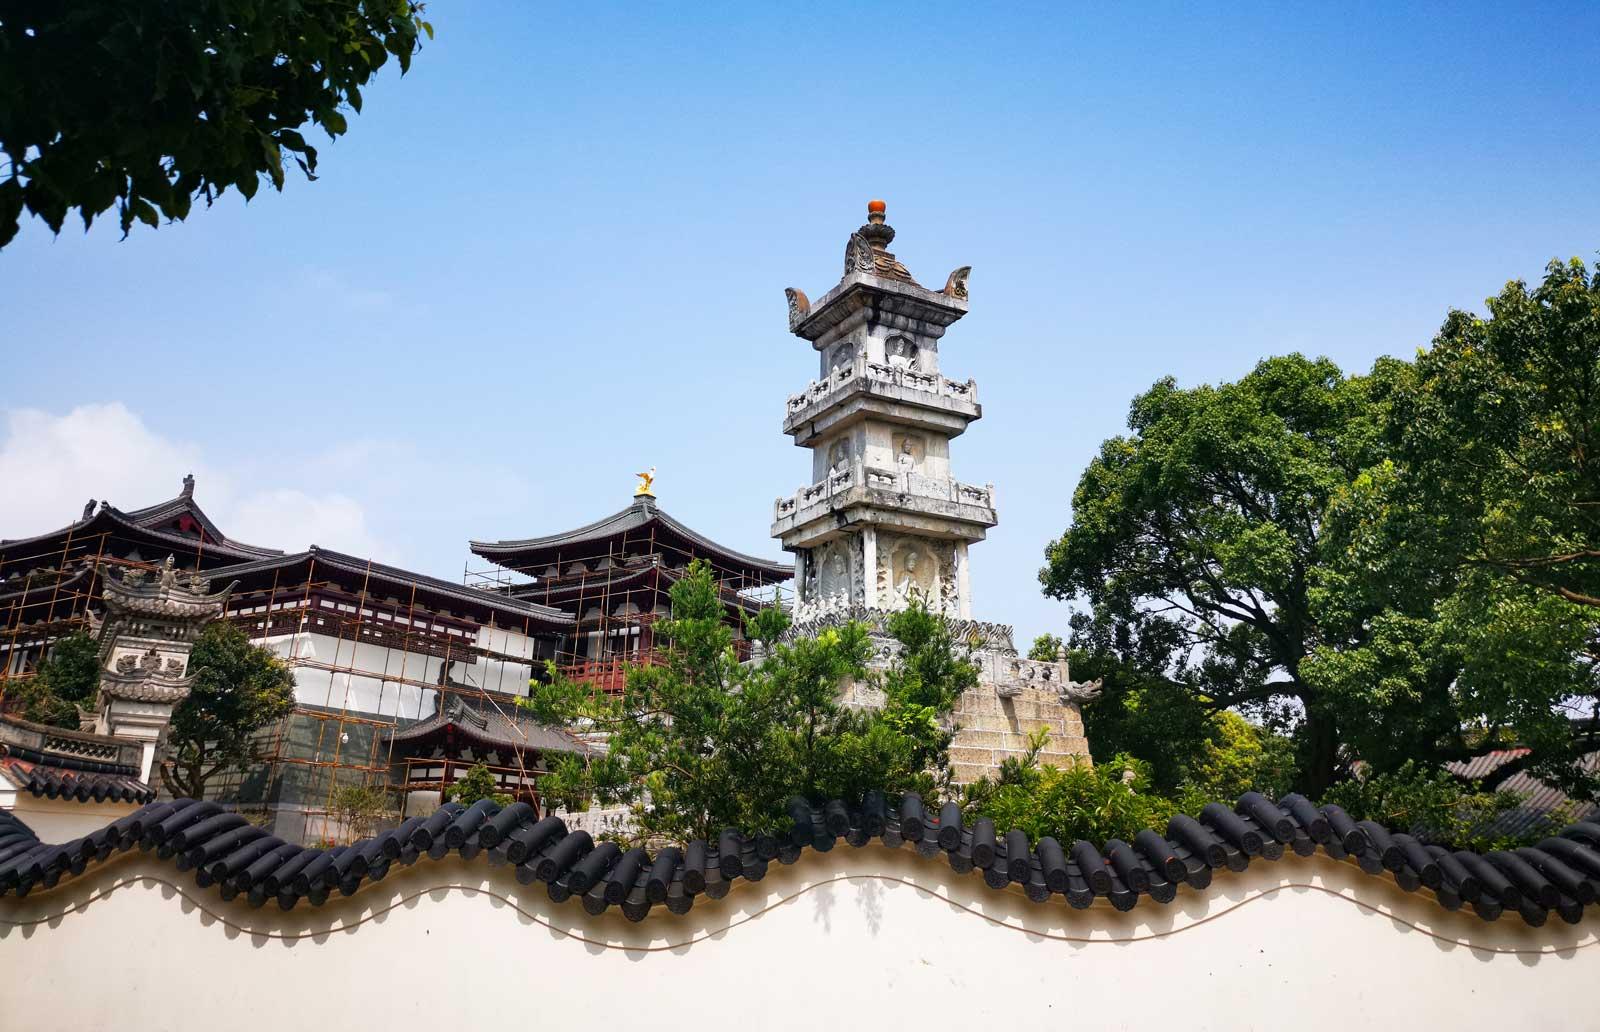 Putuo Shan Tower